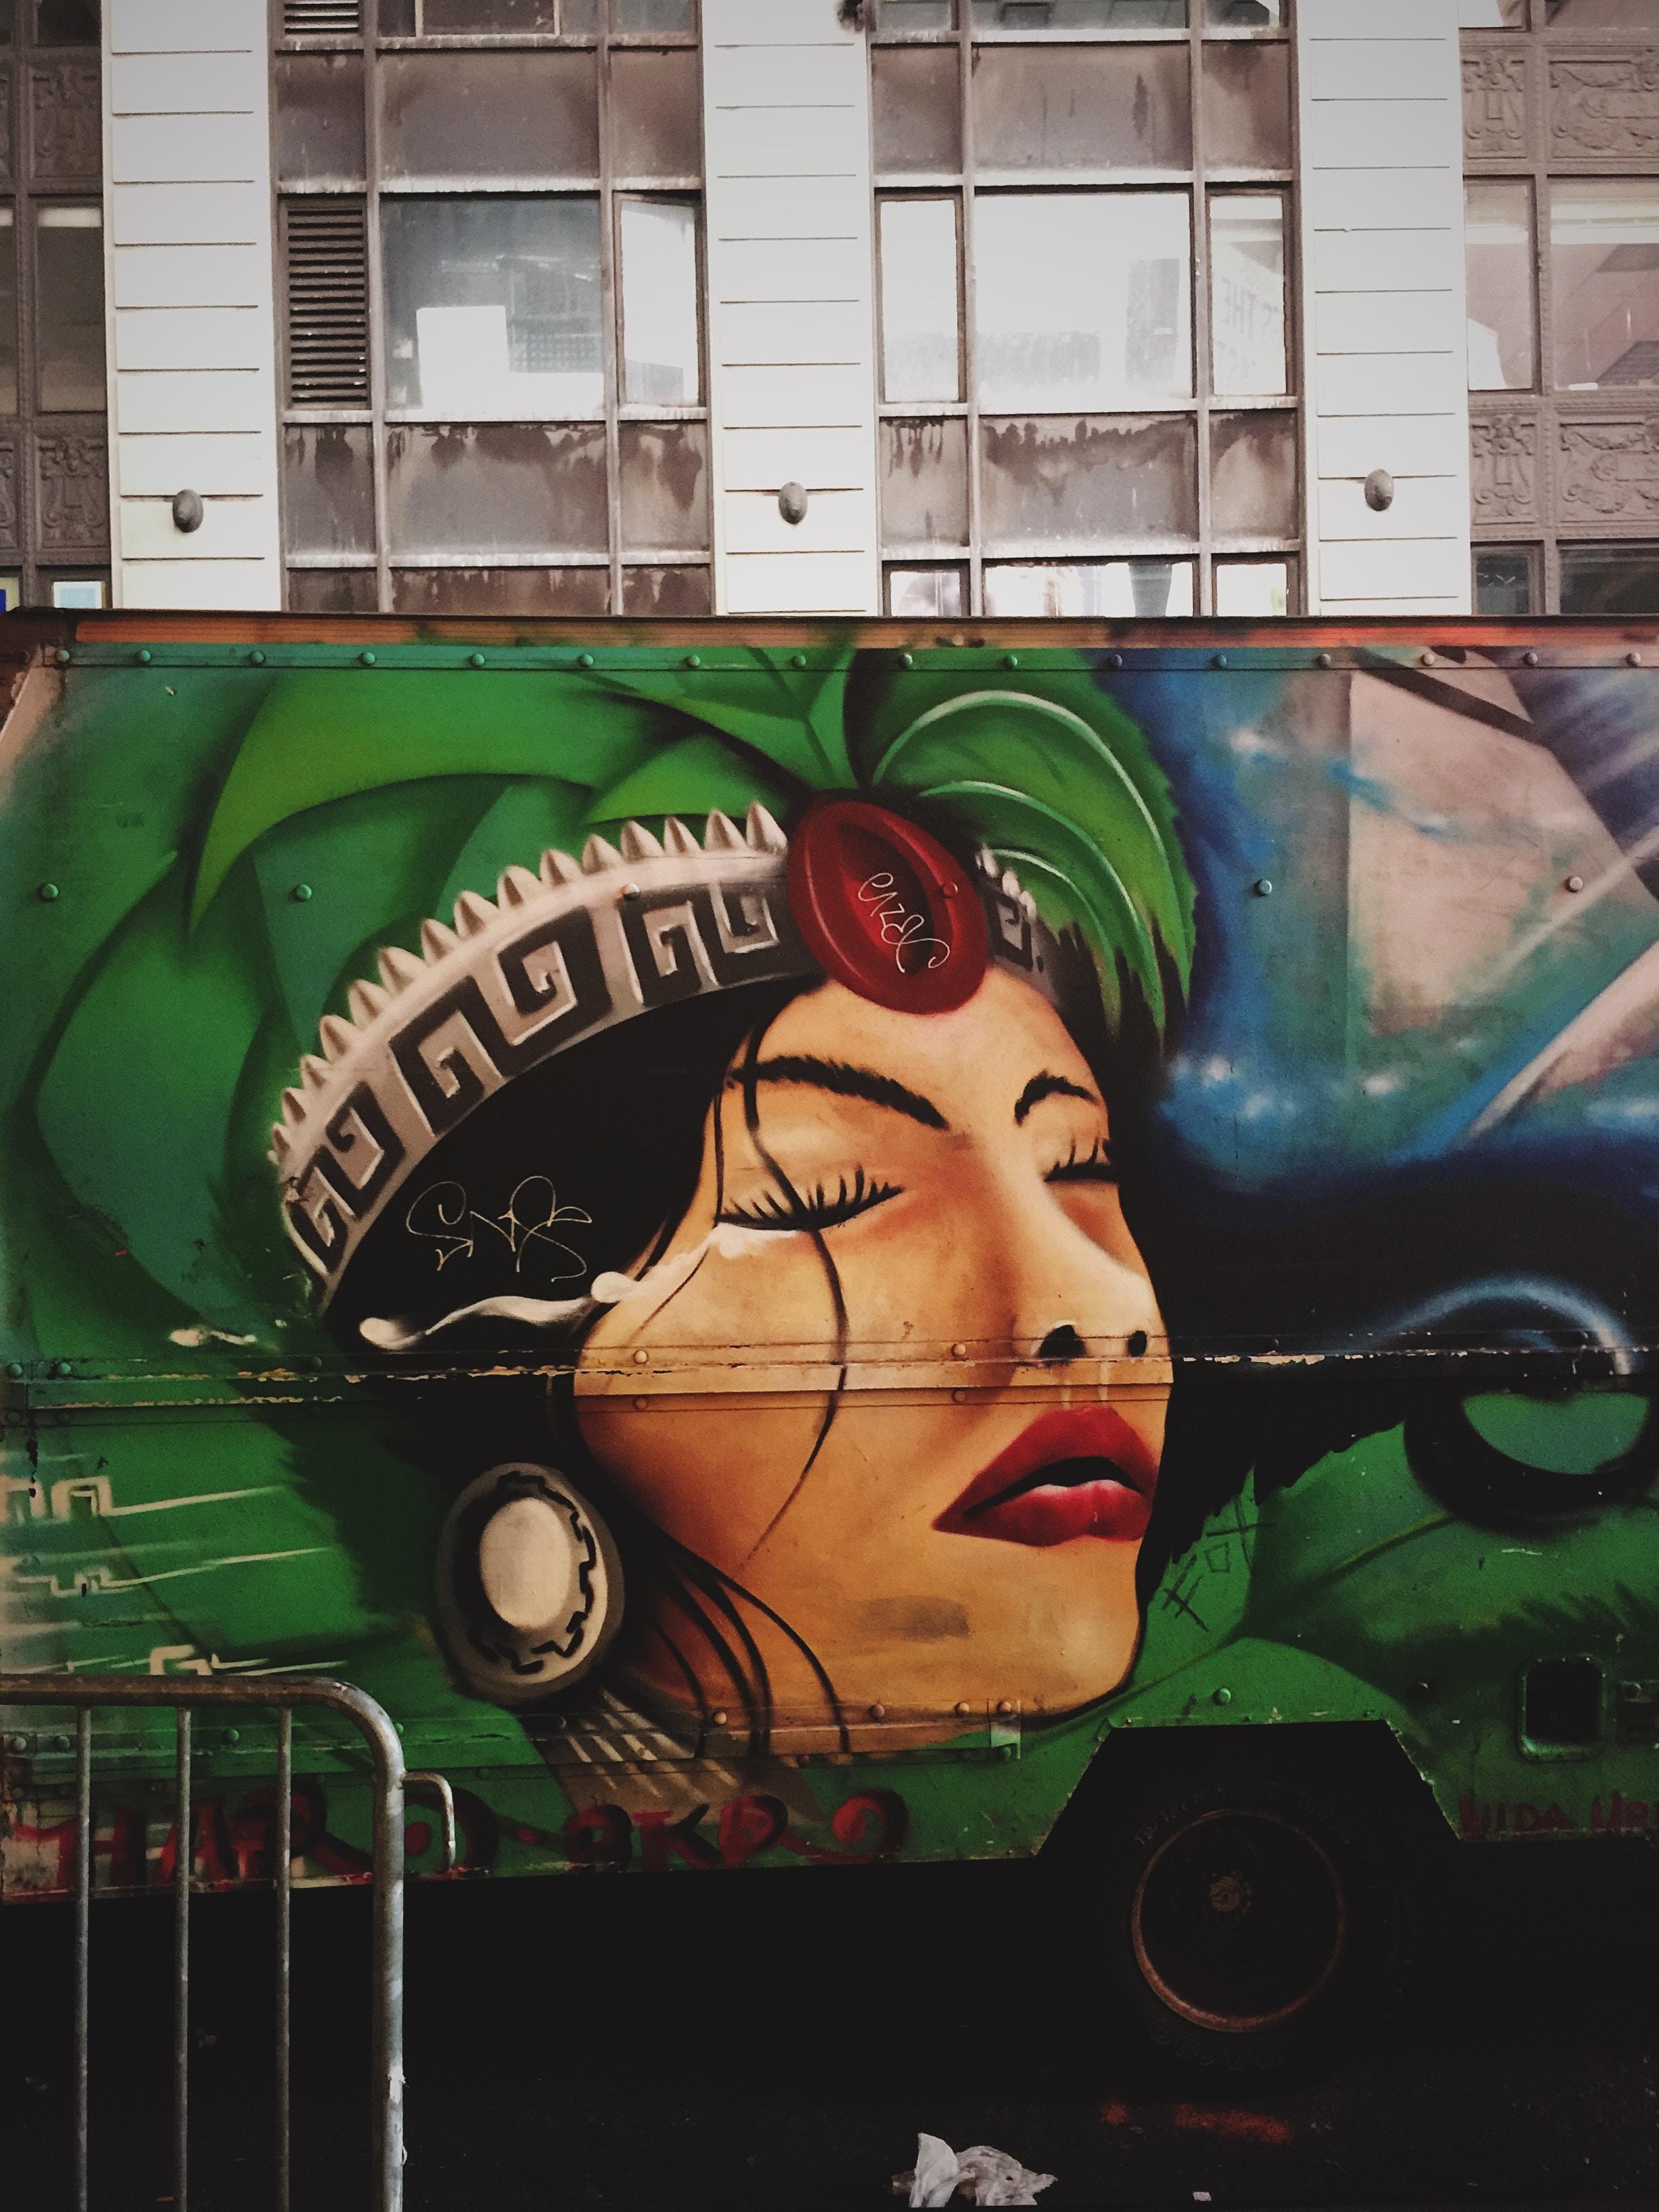 truck with graffiti near gray building